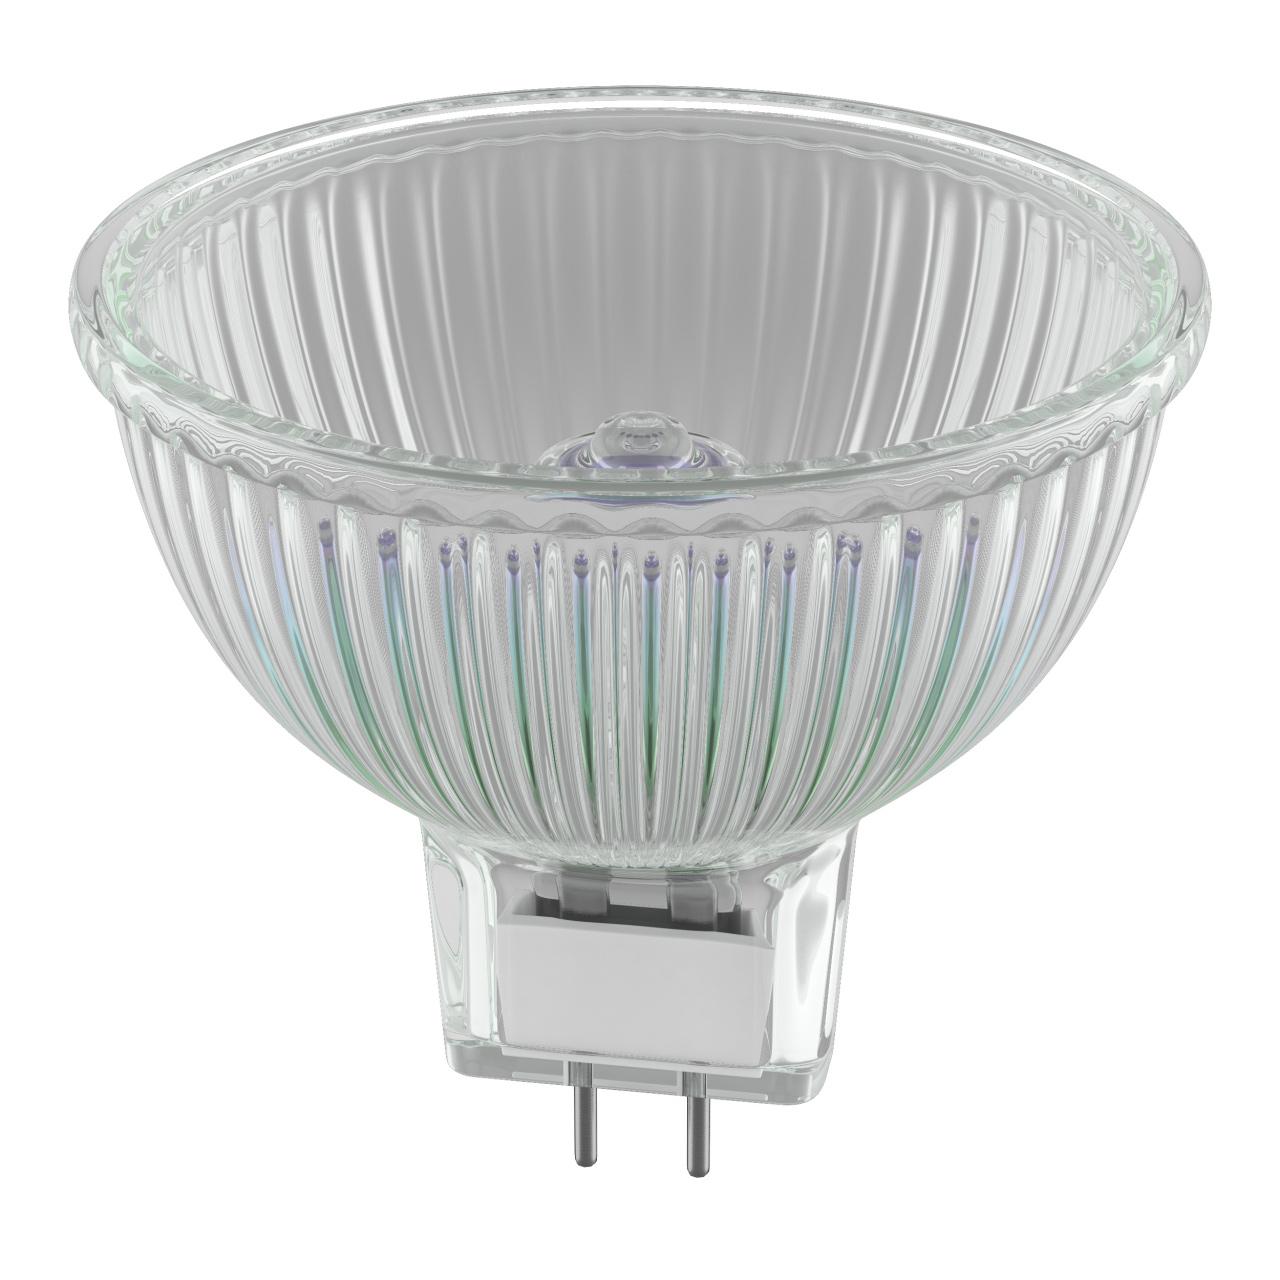 Лампа HAL 12V MR16 G5.3 50W 60G FR RA100 2800K 2000H DIMM Lightstar 921217